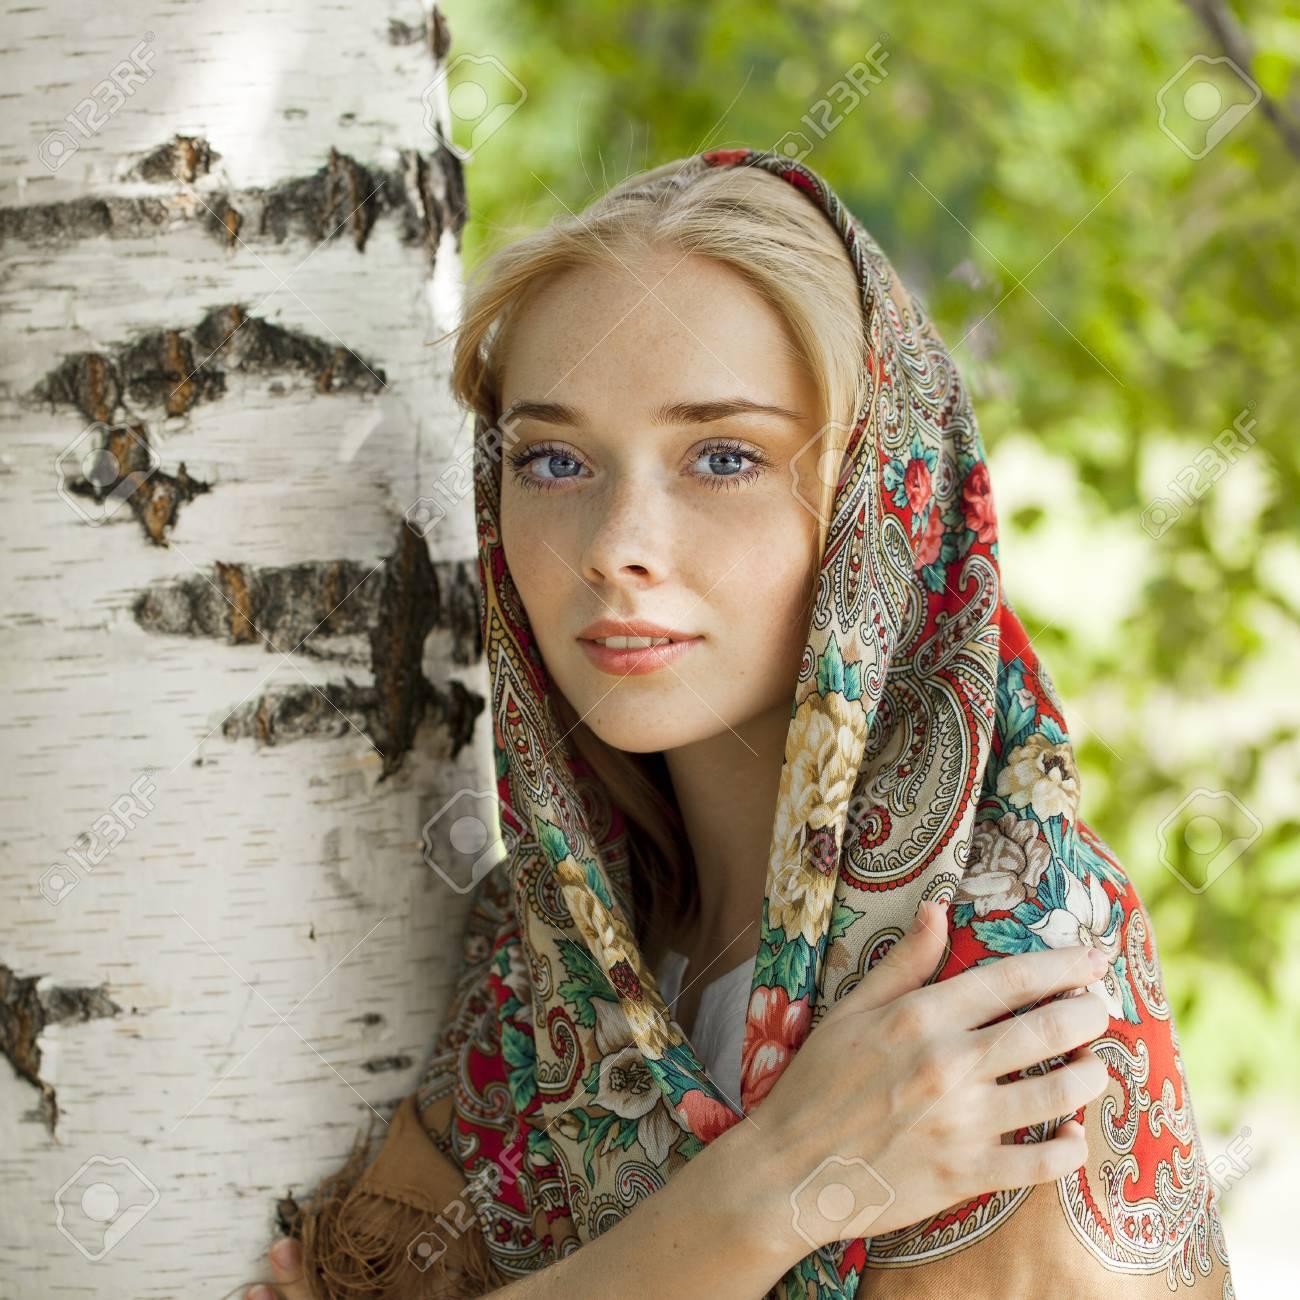 https://previews.123rf.com/images/andersonrise/andersonrise1503/andersonrise150301224/37574369-russian-beauty-woman-in-the-national-patterned-scarf.jpg